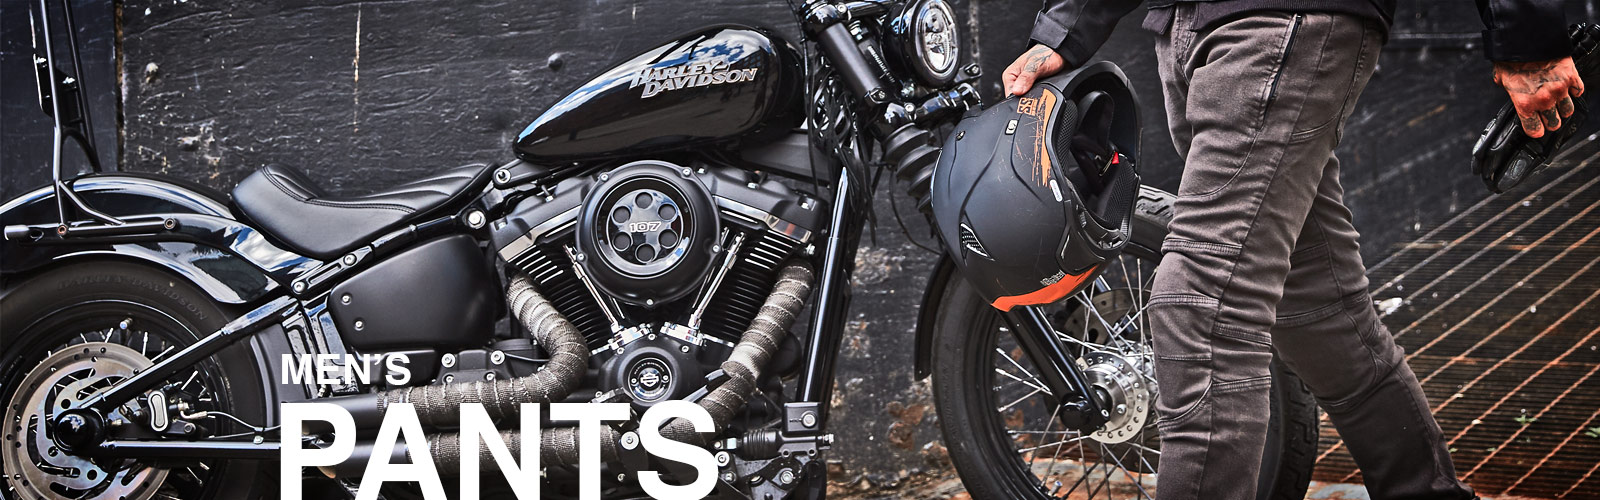 Men's Motorcycle Pants